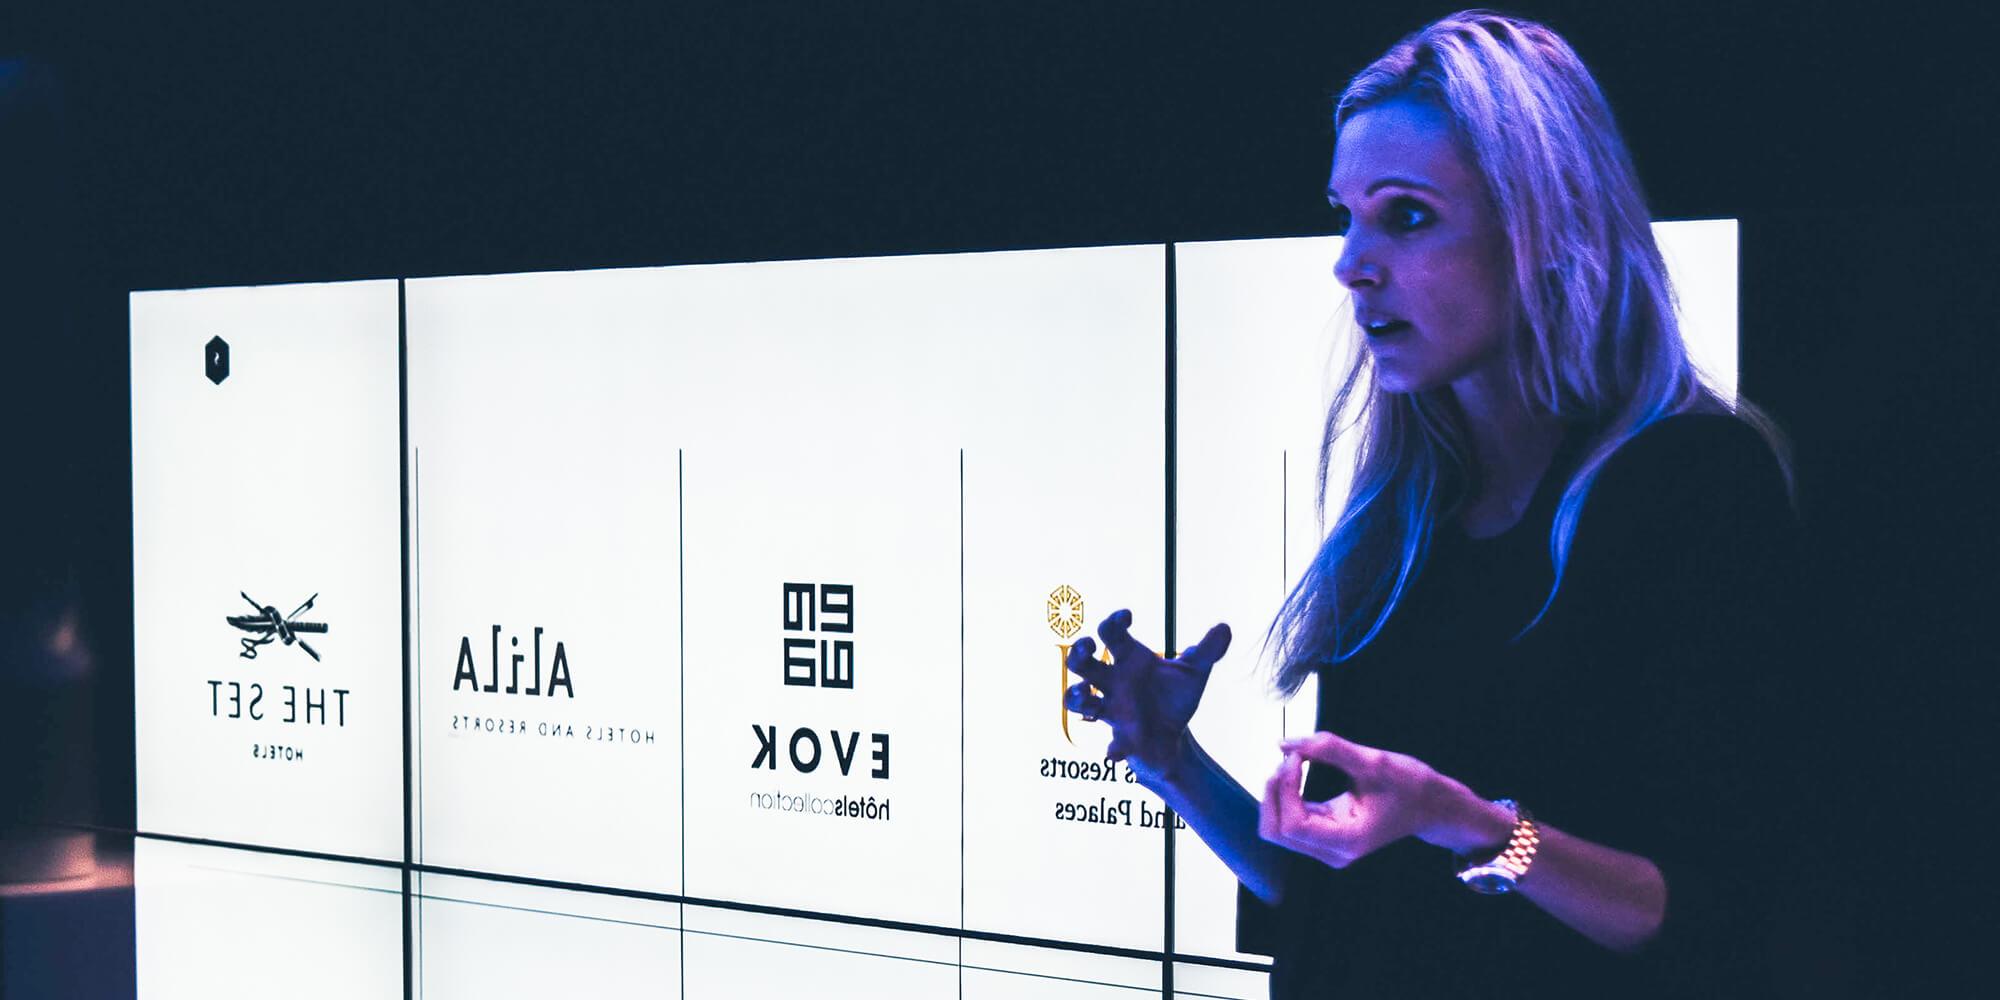 Sophie Toh, Toh PR Founder Speaking